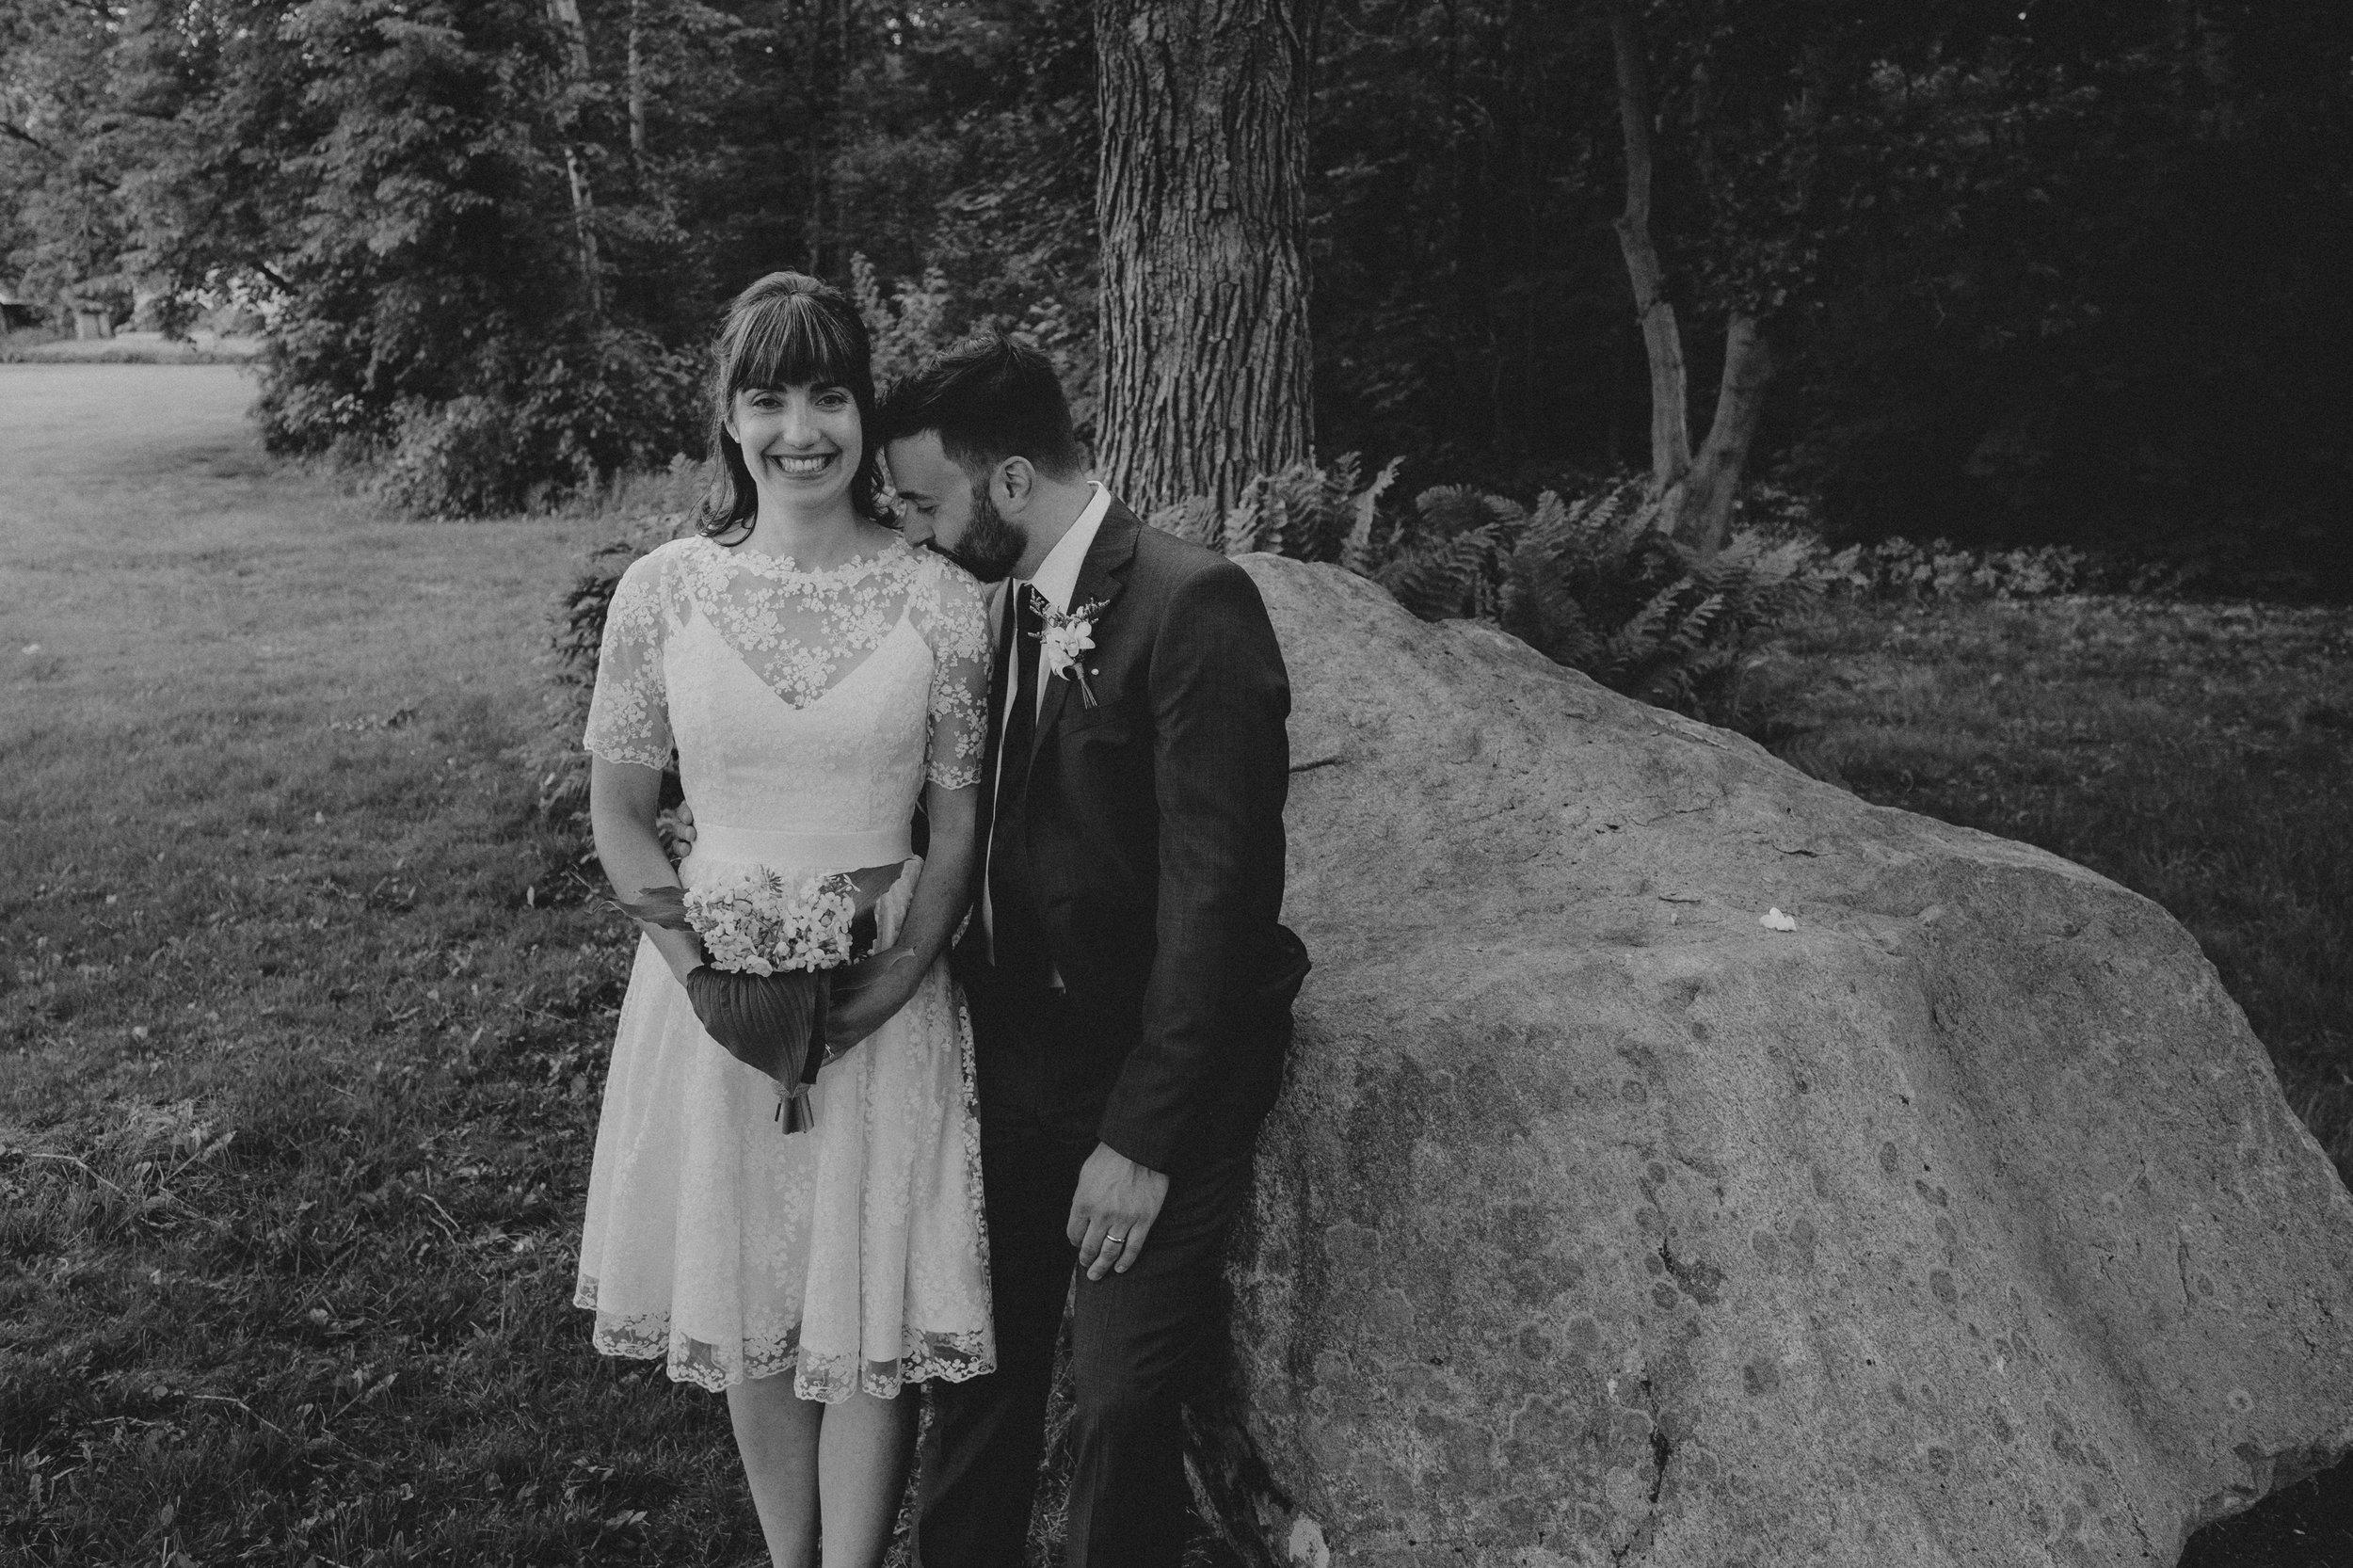 Otterburn+Wedding+Annabelle+Agnew+Photography+LR-92.jpg